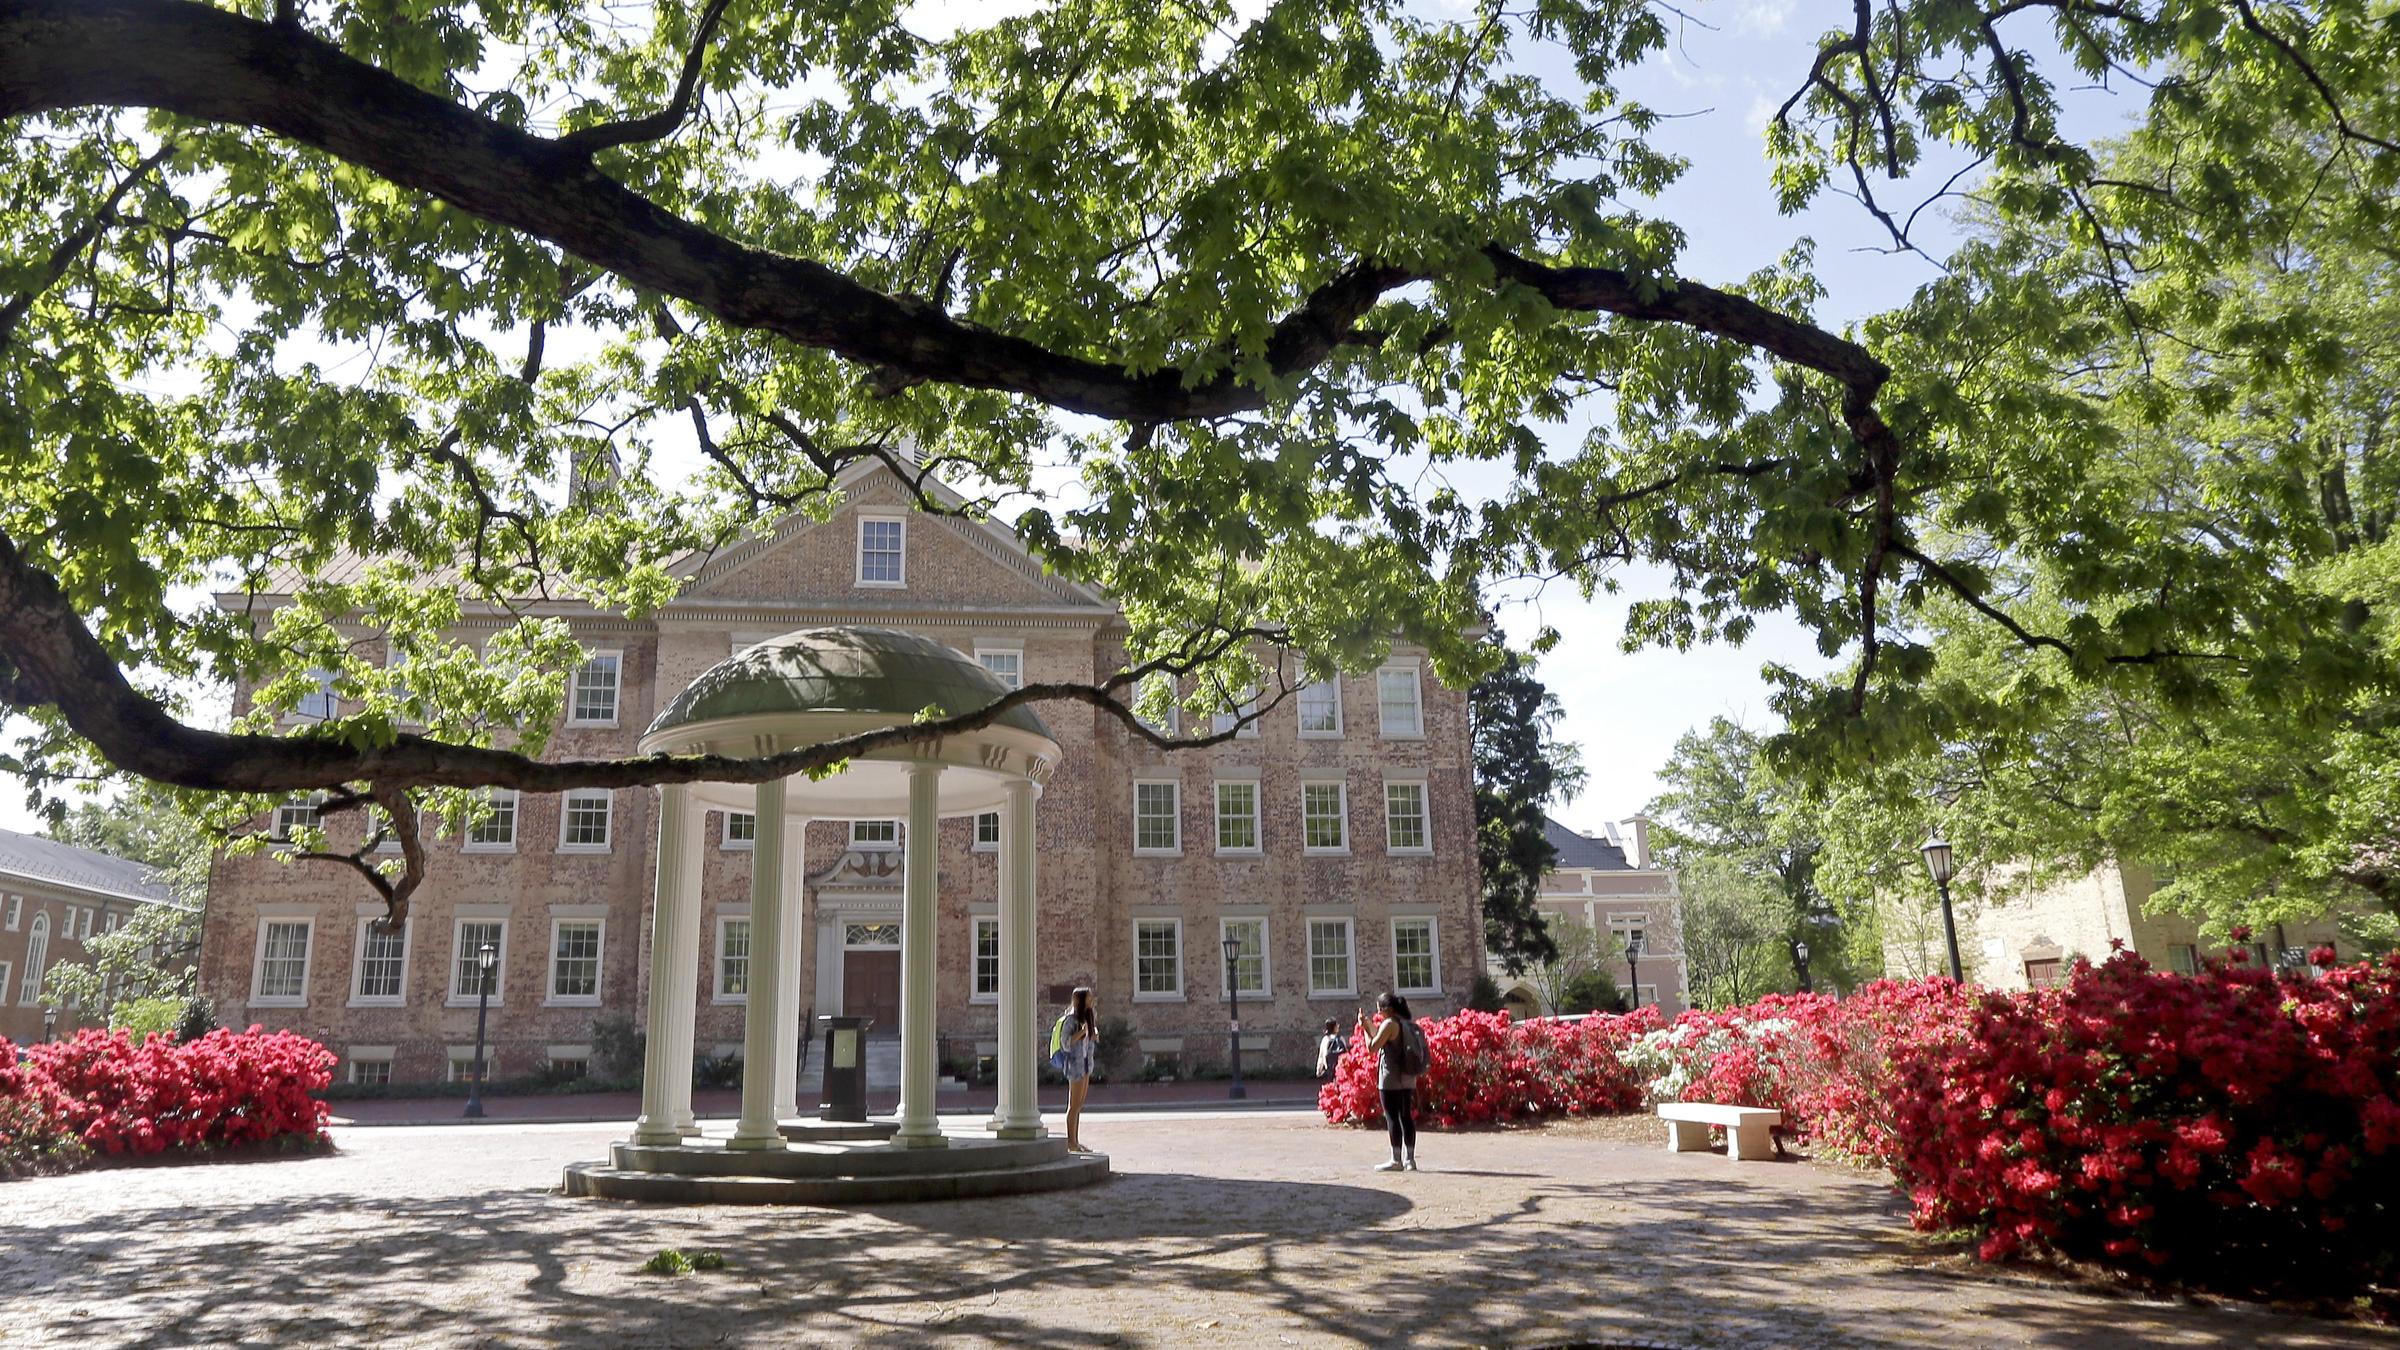 University Of North Carolina Charged With 5 Level 1